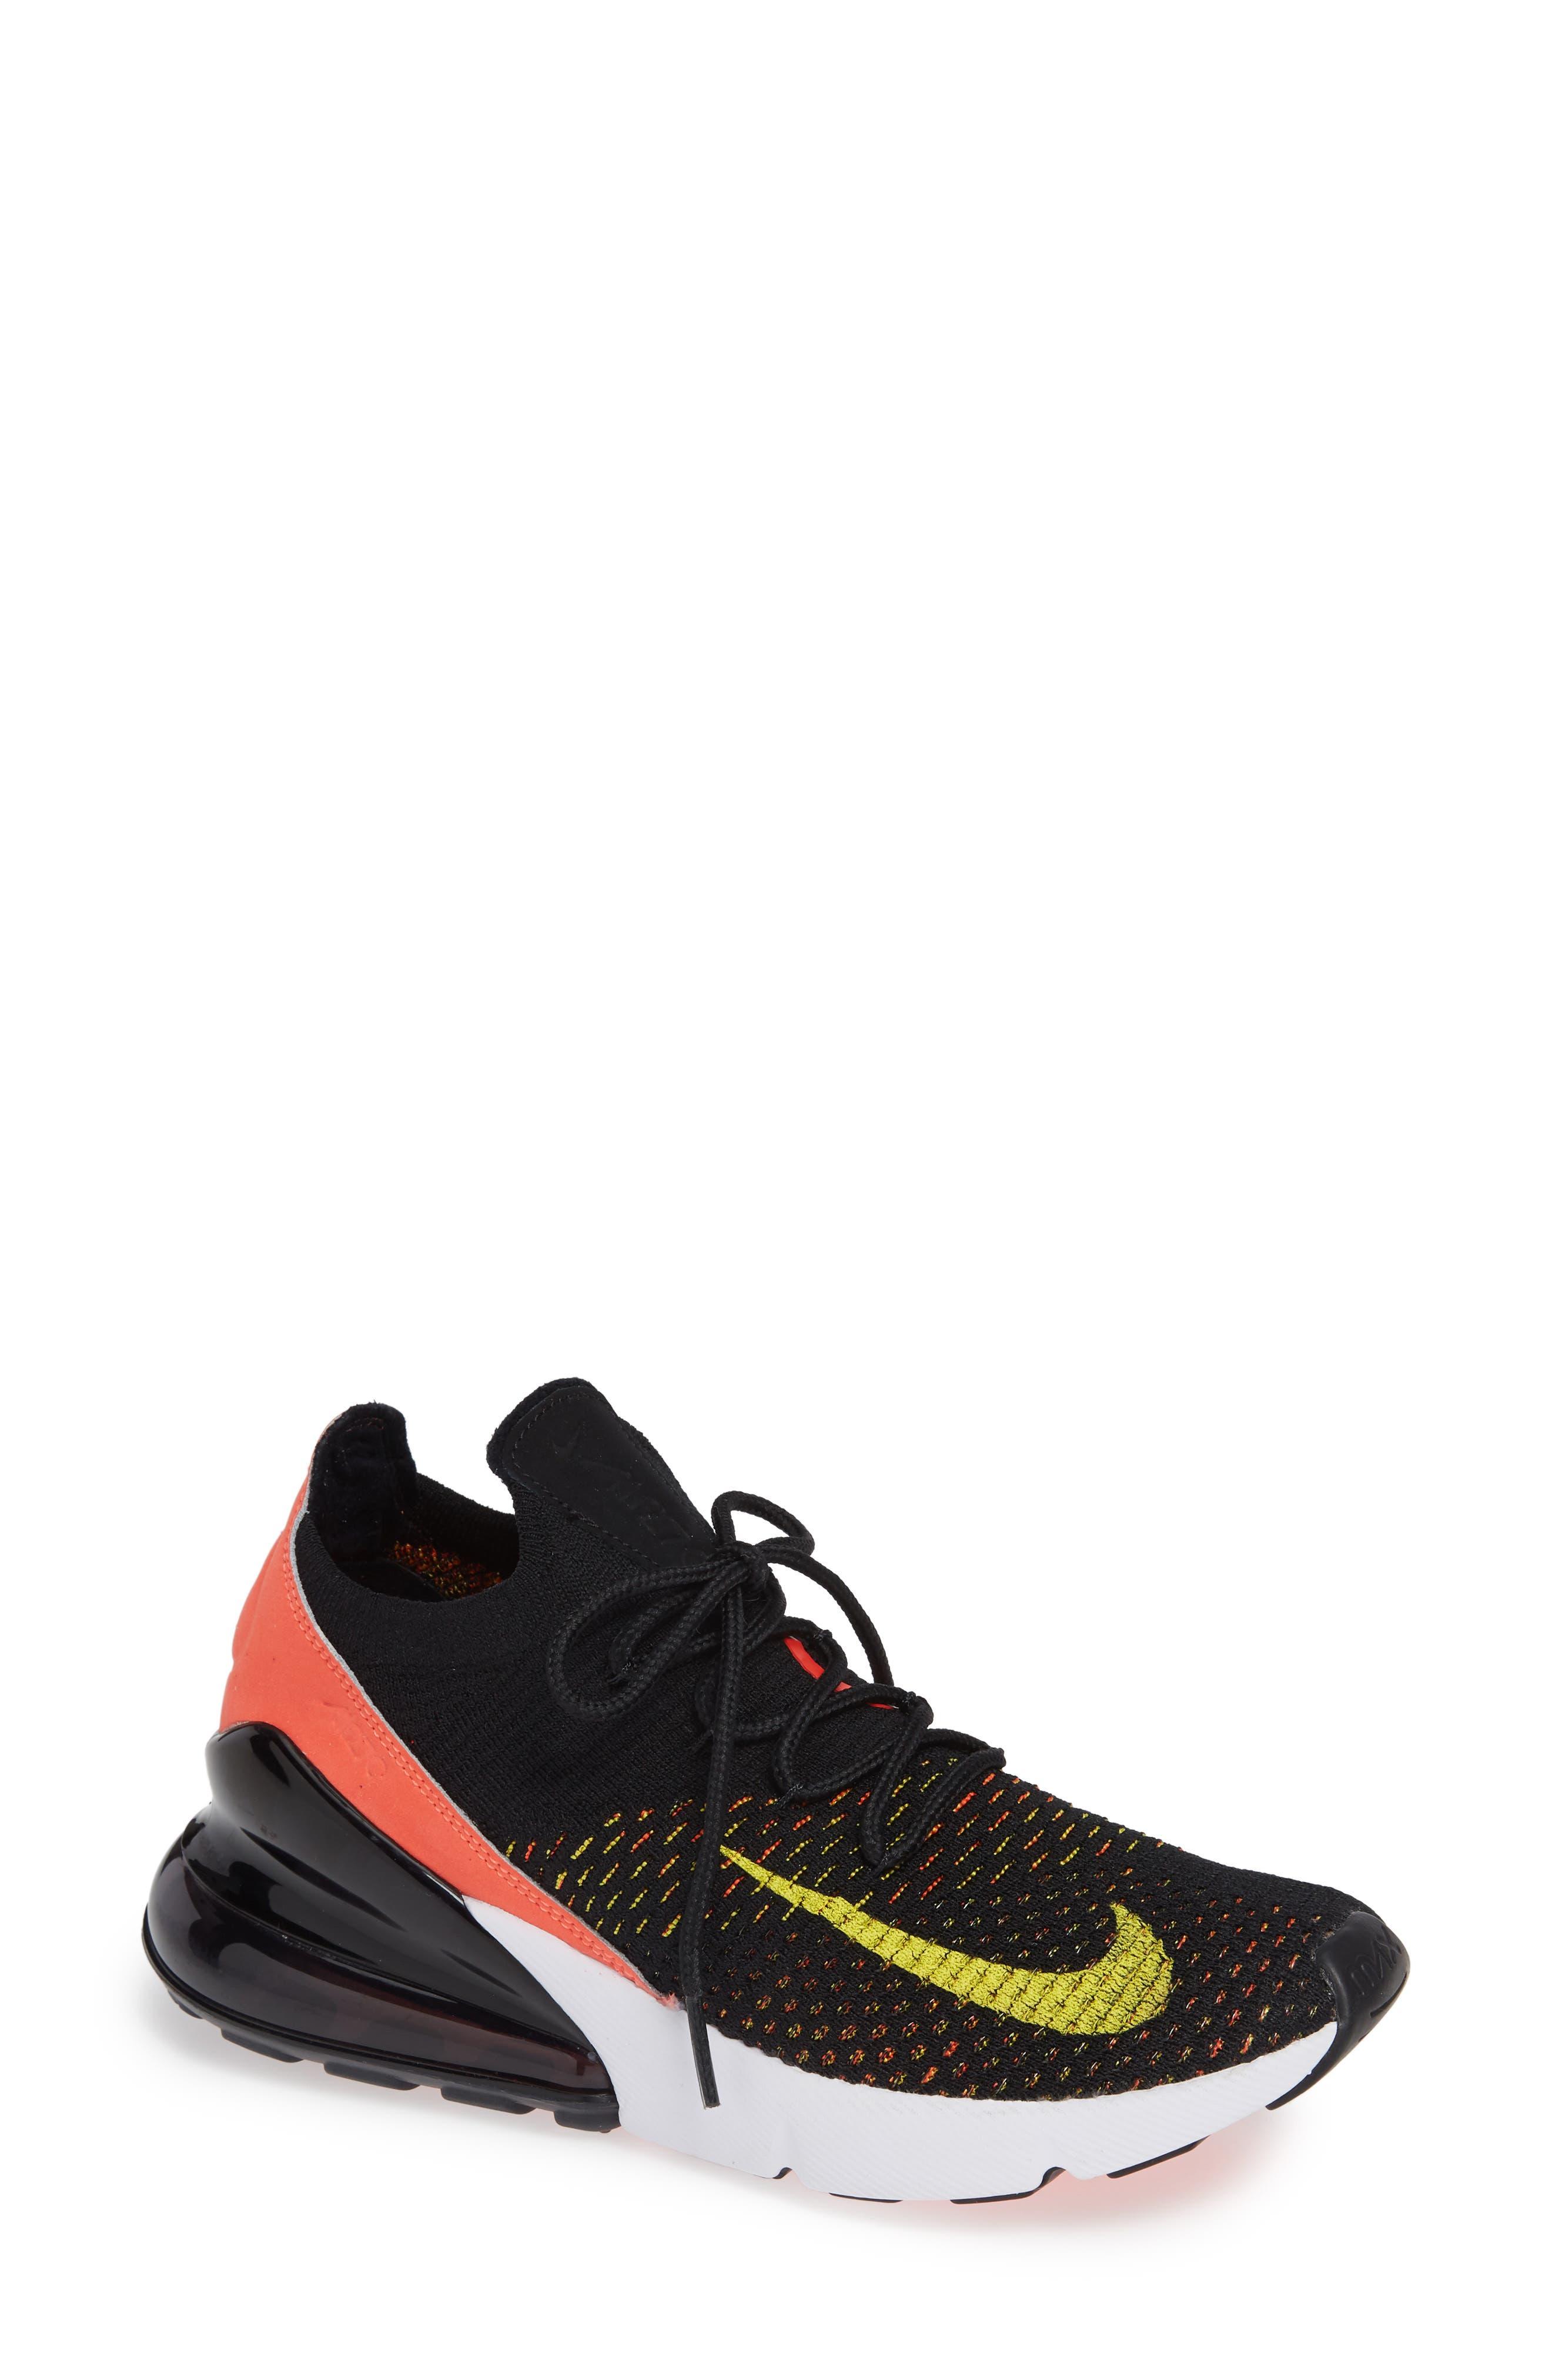 Air Max 270 Flyknit Sneaker,                         Main,                         color, BLACK/ YELLOW STRIKE/ CRIMSON